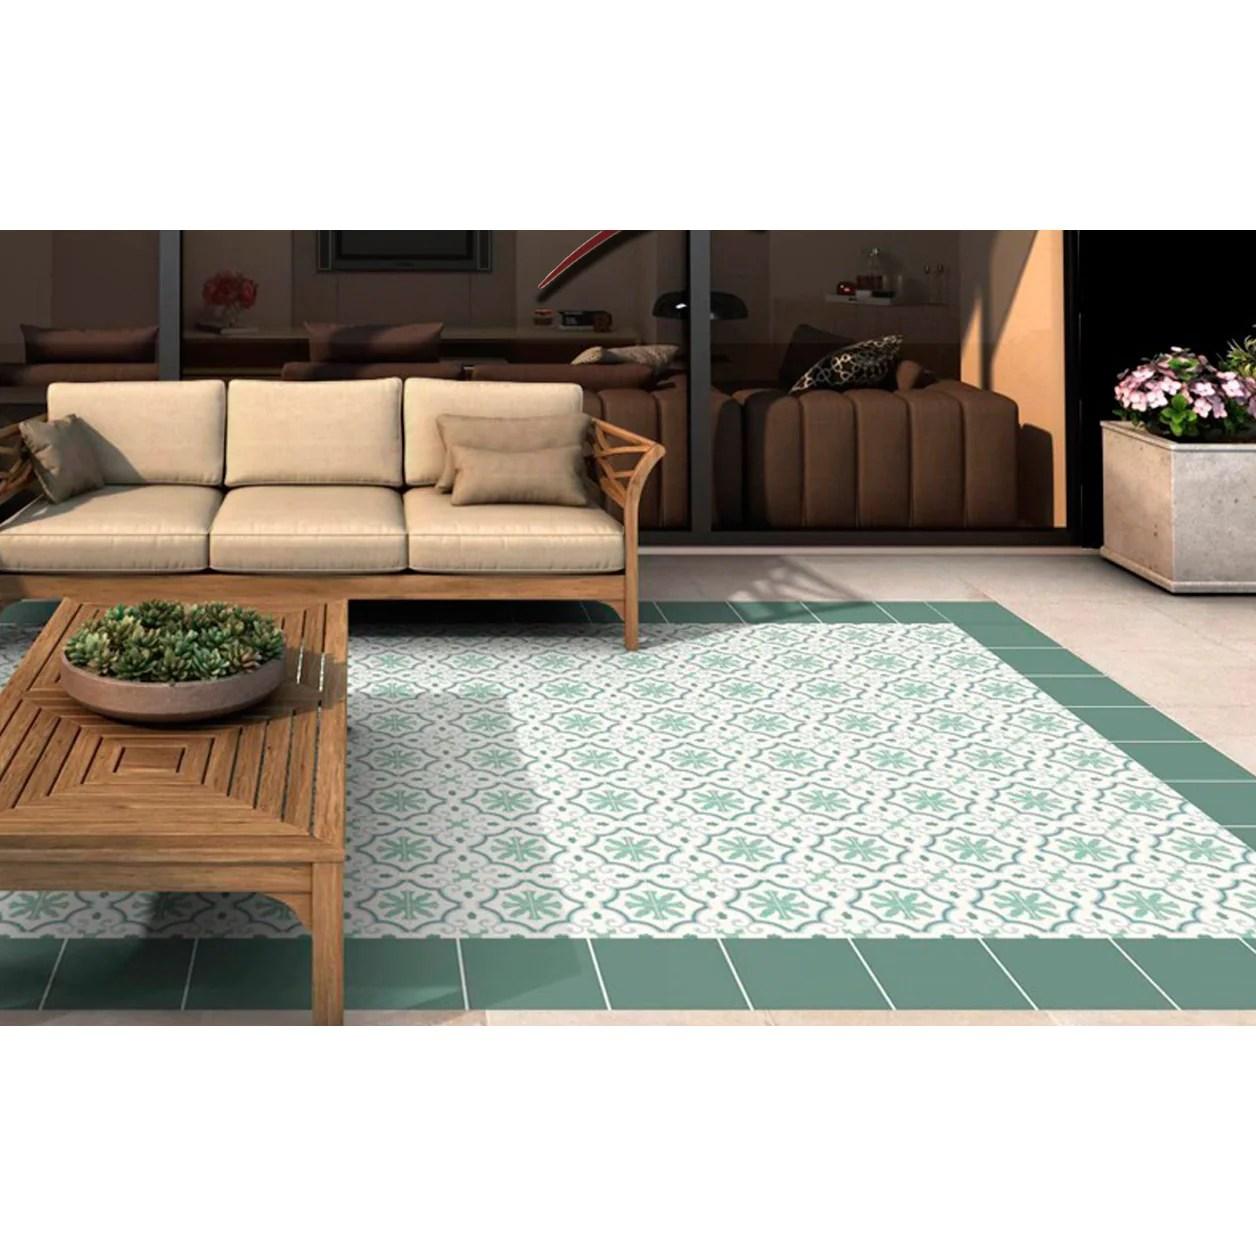 general ceramic 10 in x 10 in riviera montecarlo green deco tile